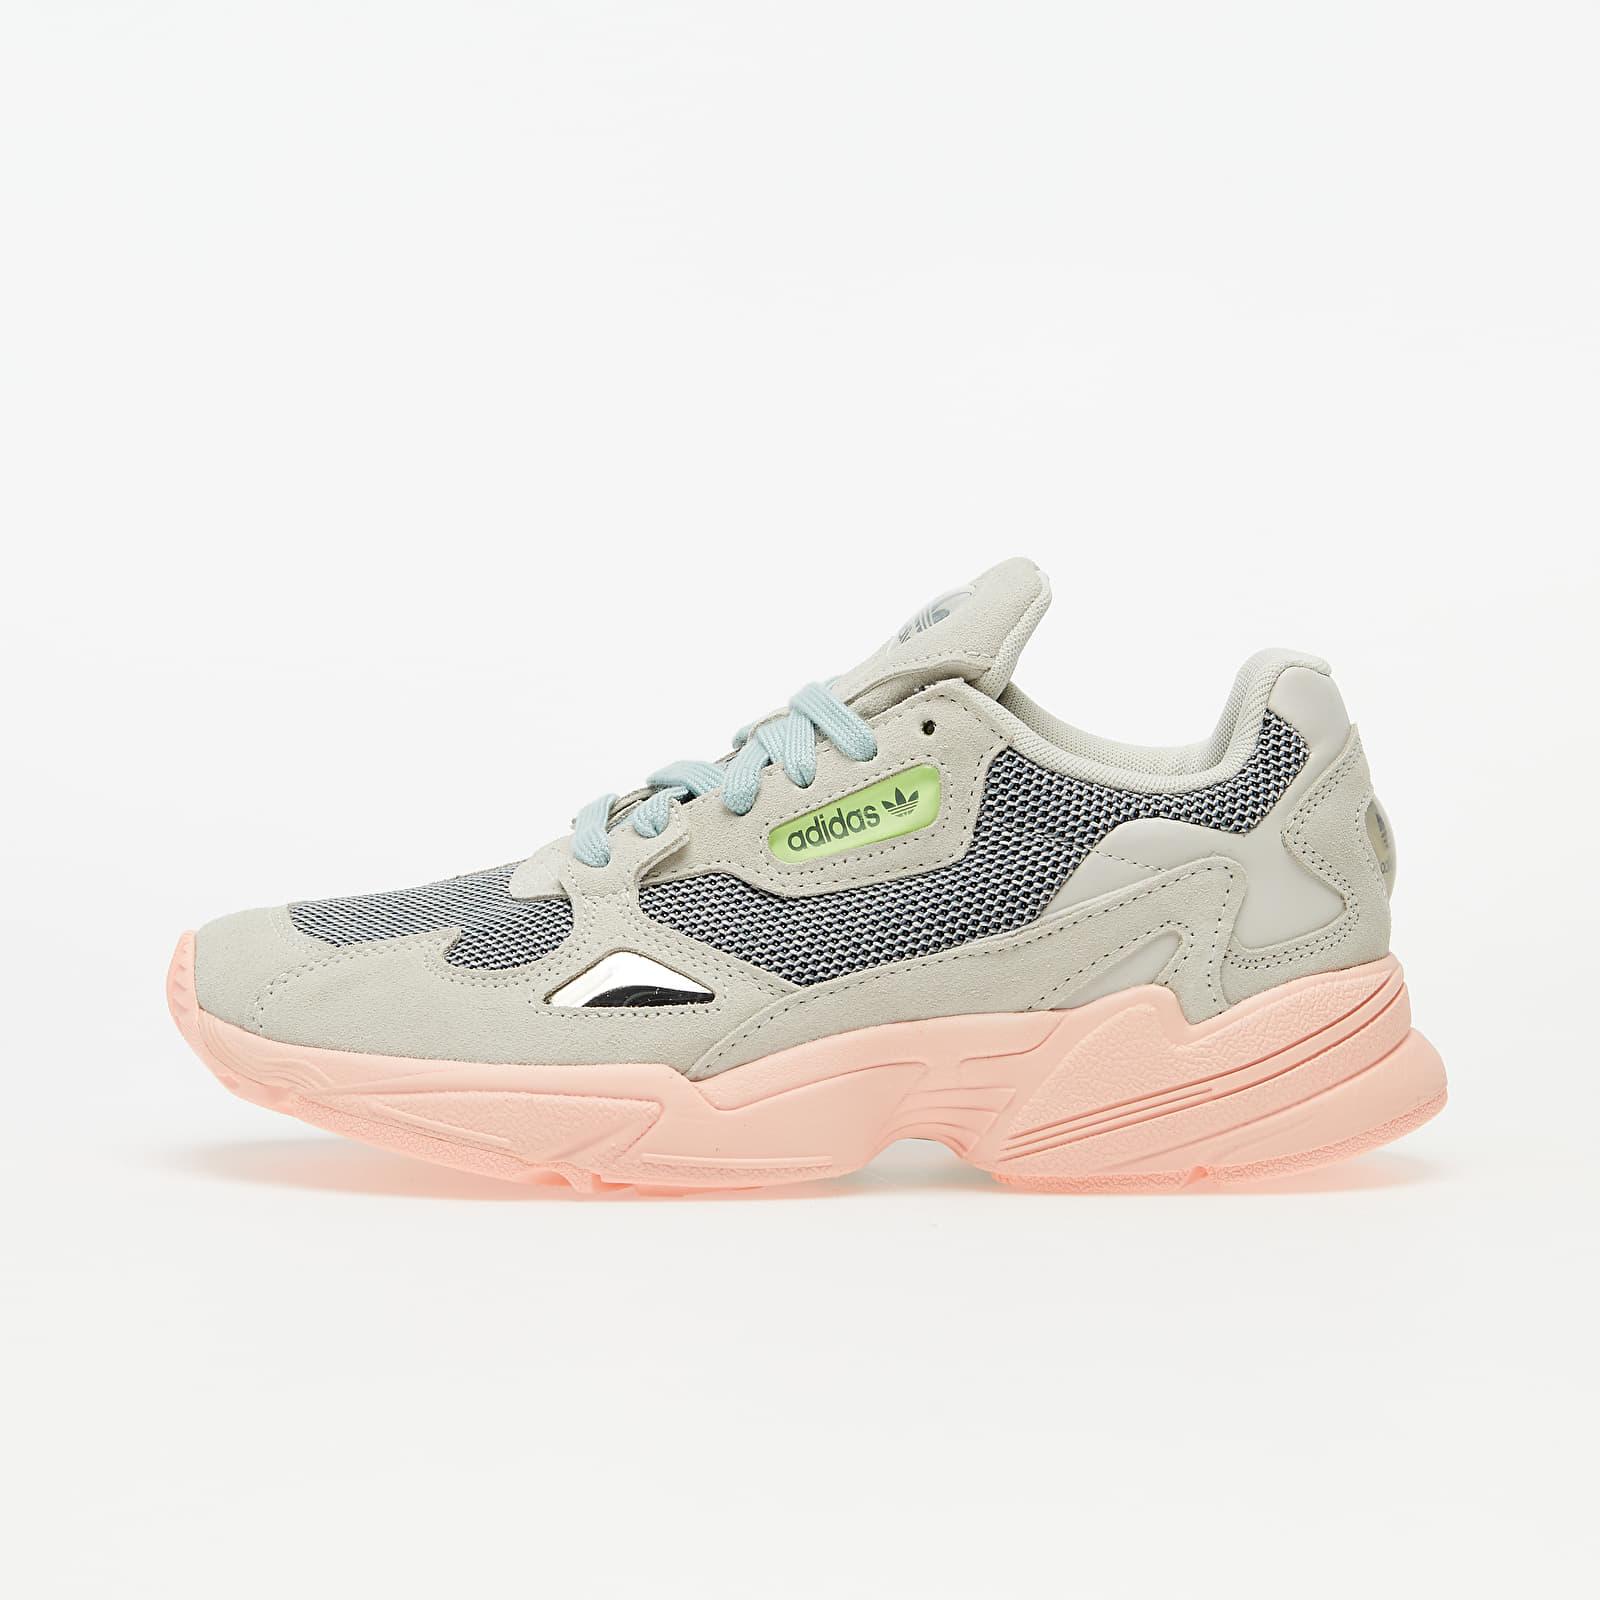 adidas Falcon W Talc/ Haze Coral/ Green Tint EUR 38